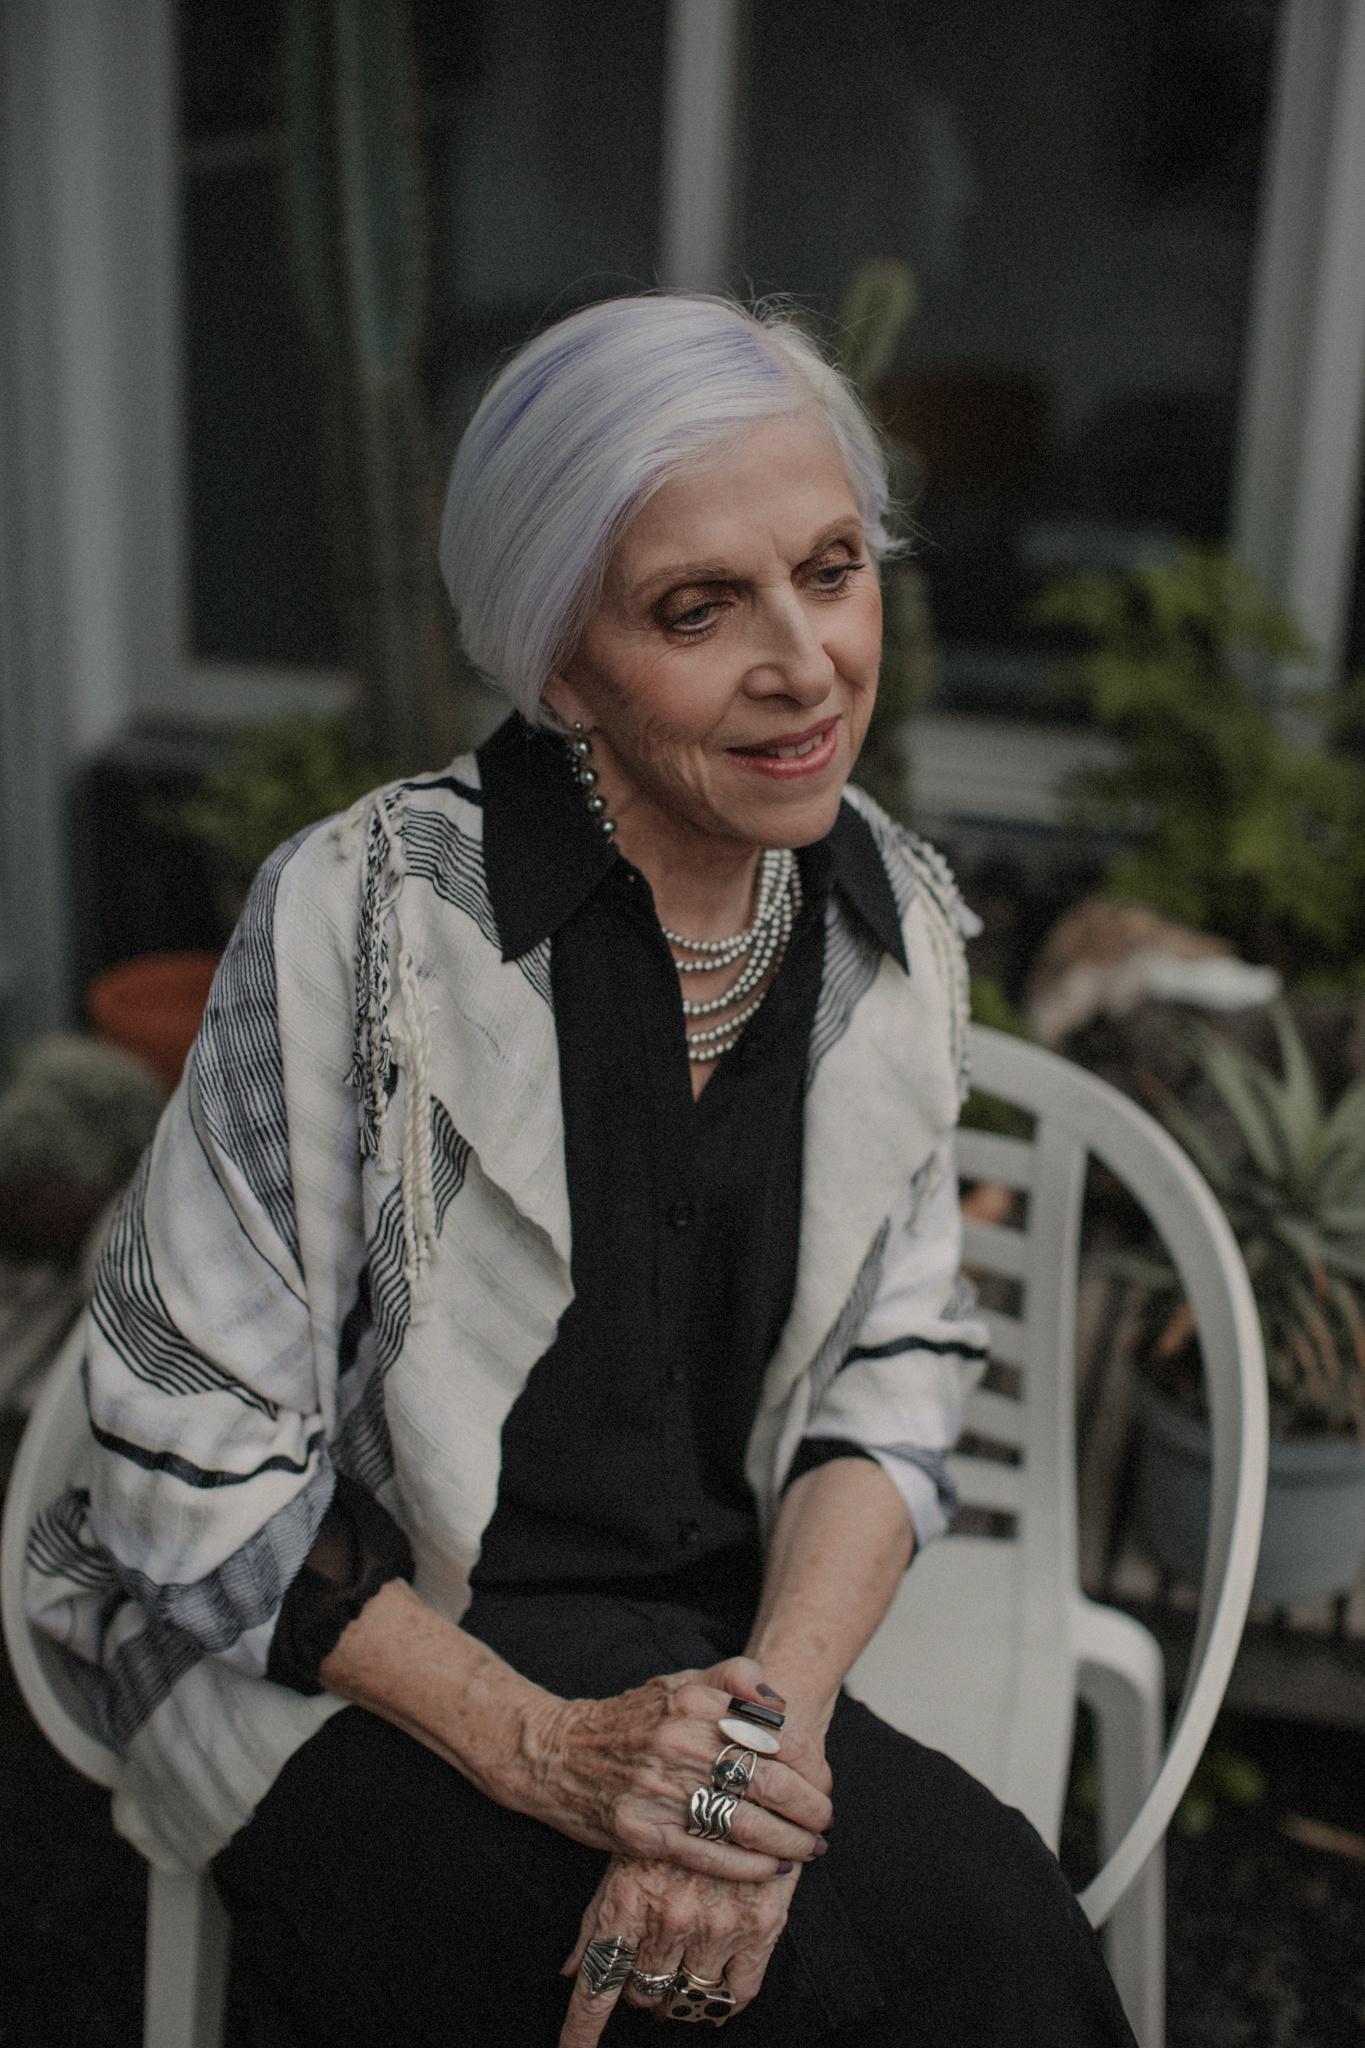 Anna Fusoni - principal networker de la moda 5